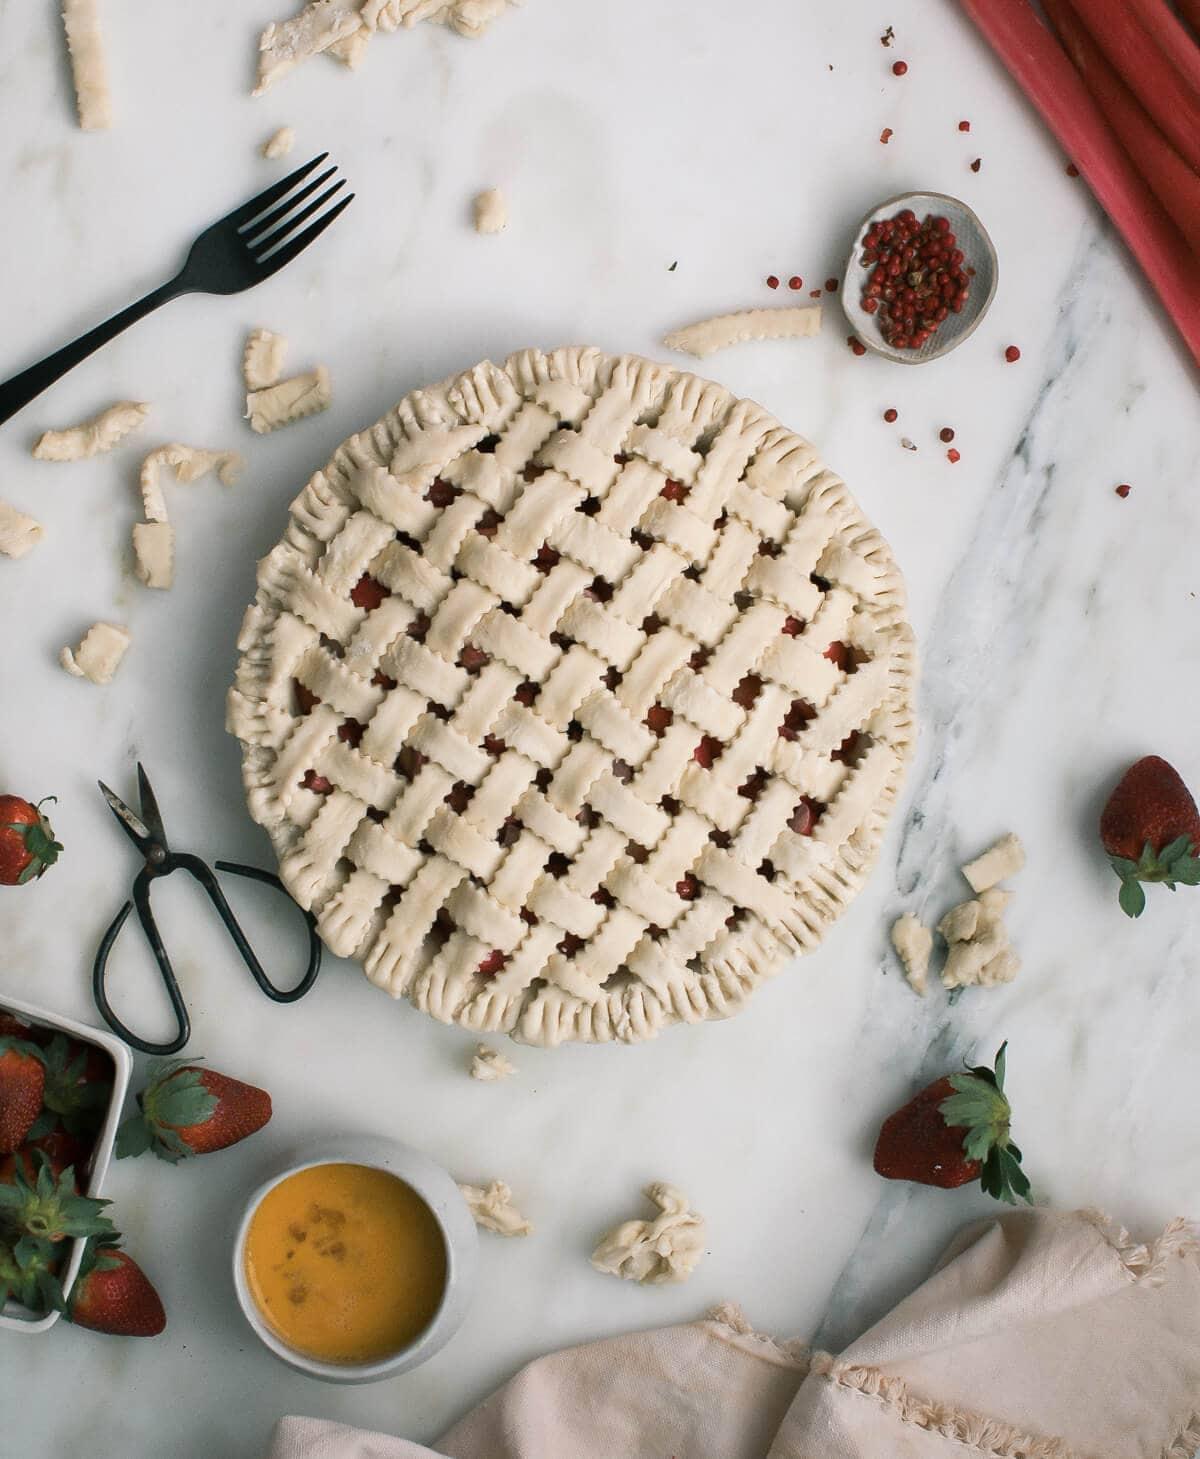 Rhubarb Strawberry Pink Peppercorn Pie A Cozy Kitchen